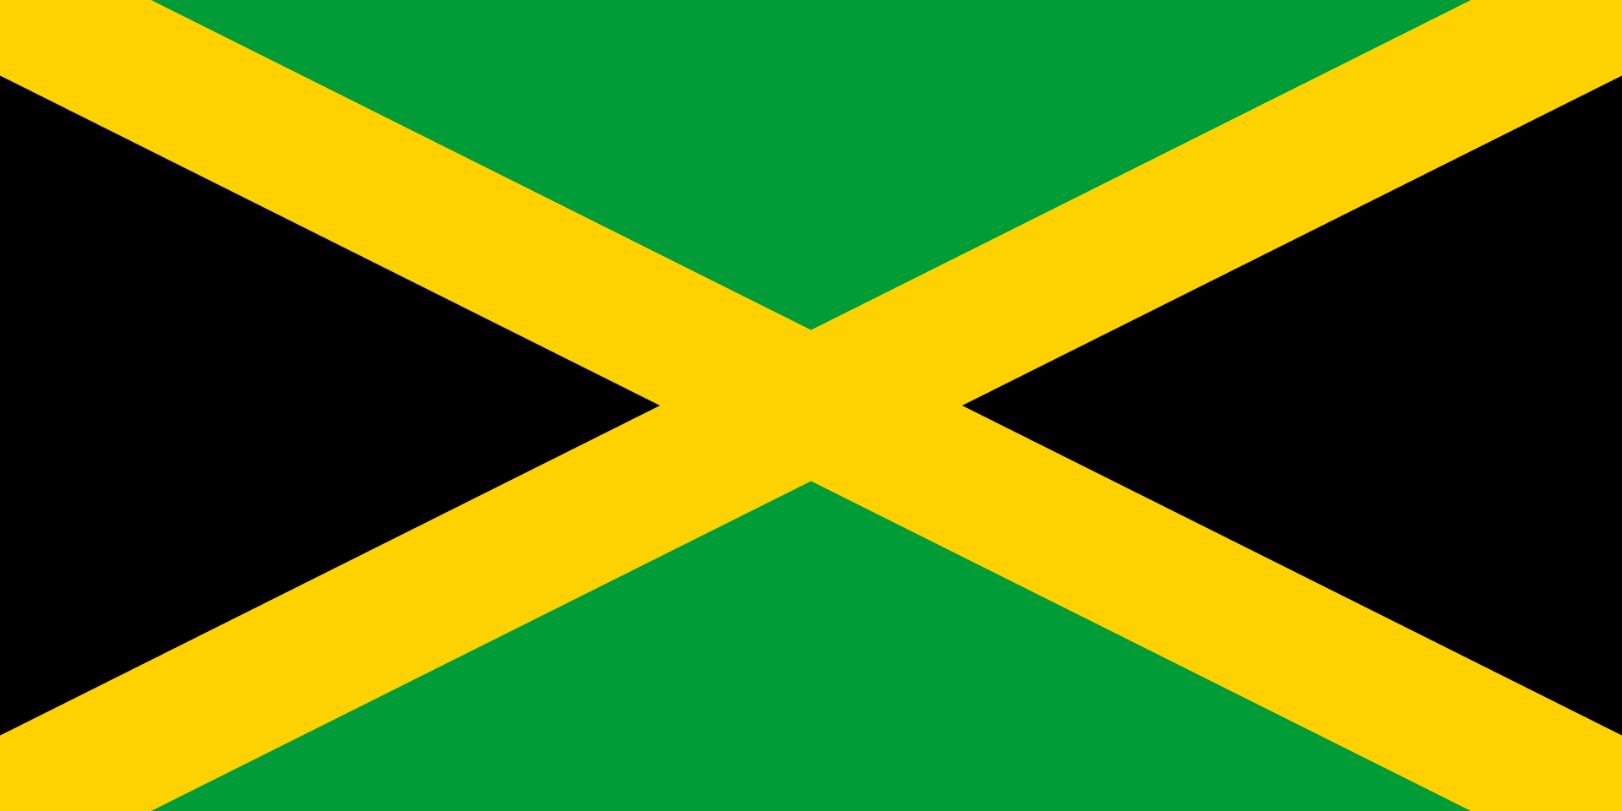 Flagge im Querformat Land Jamaika 150x100 cm